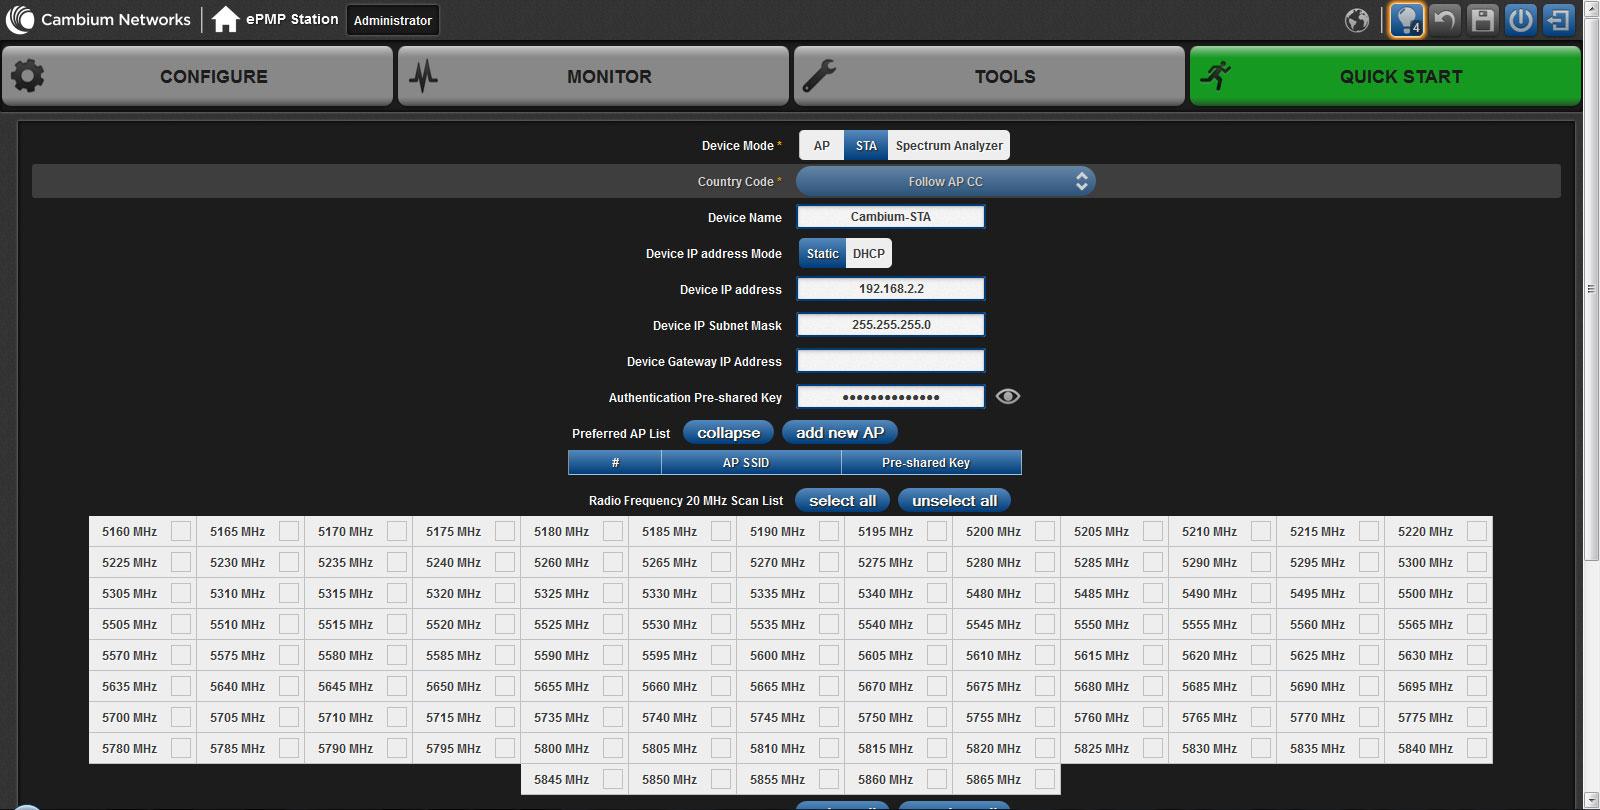 Настройка протокола HTTRs для Cambium Networks ePMP-1000